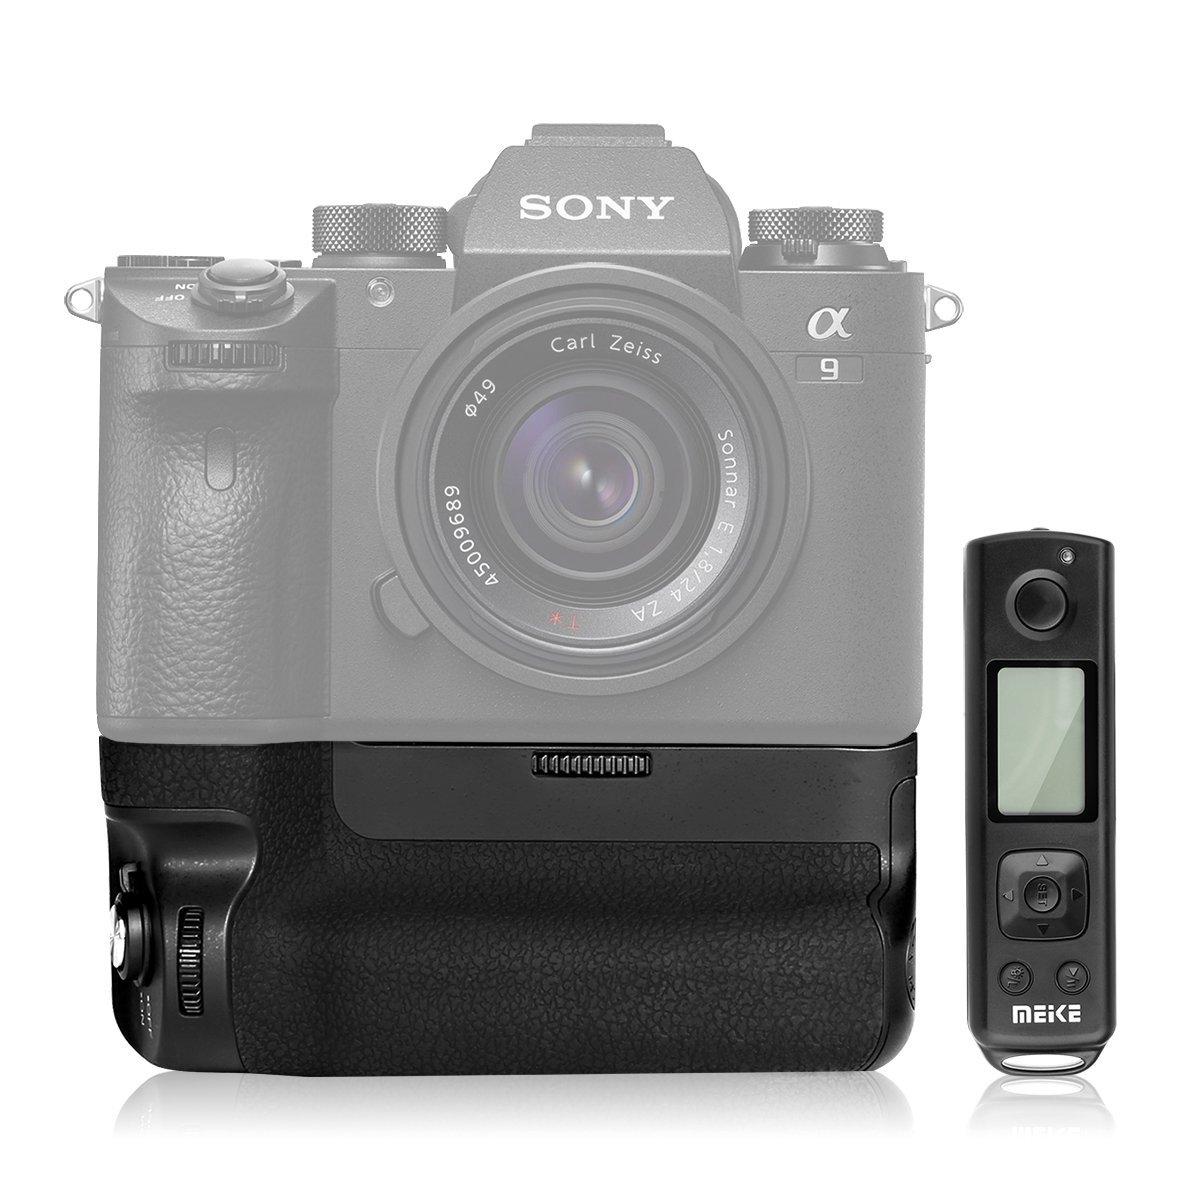 Батарейный блок Meike MK-A9 с камерой Sony A9